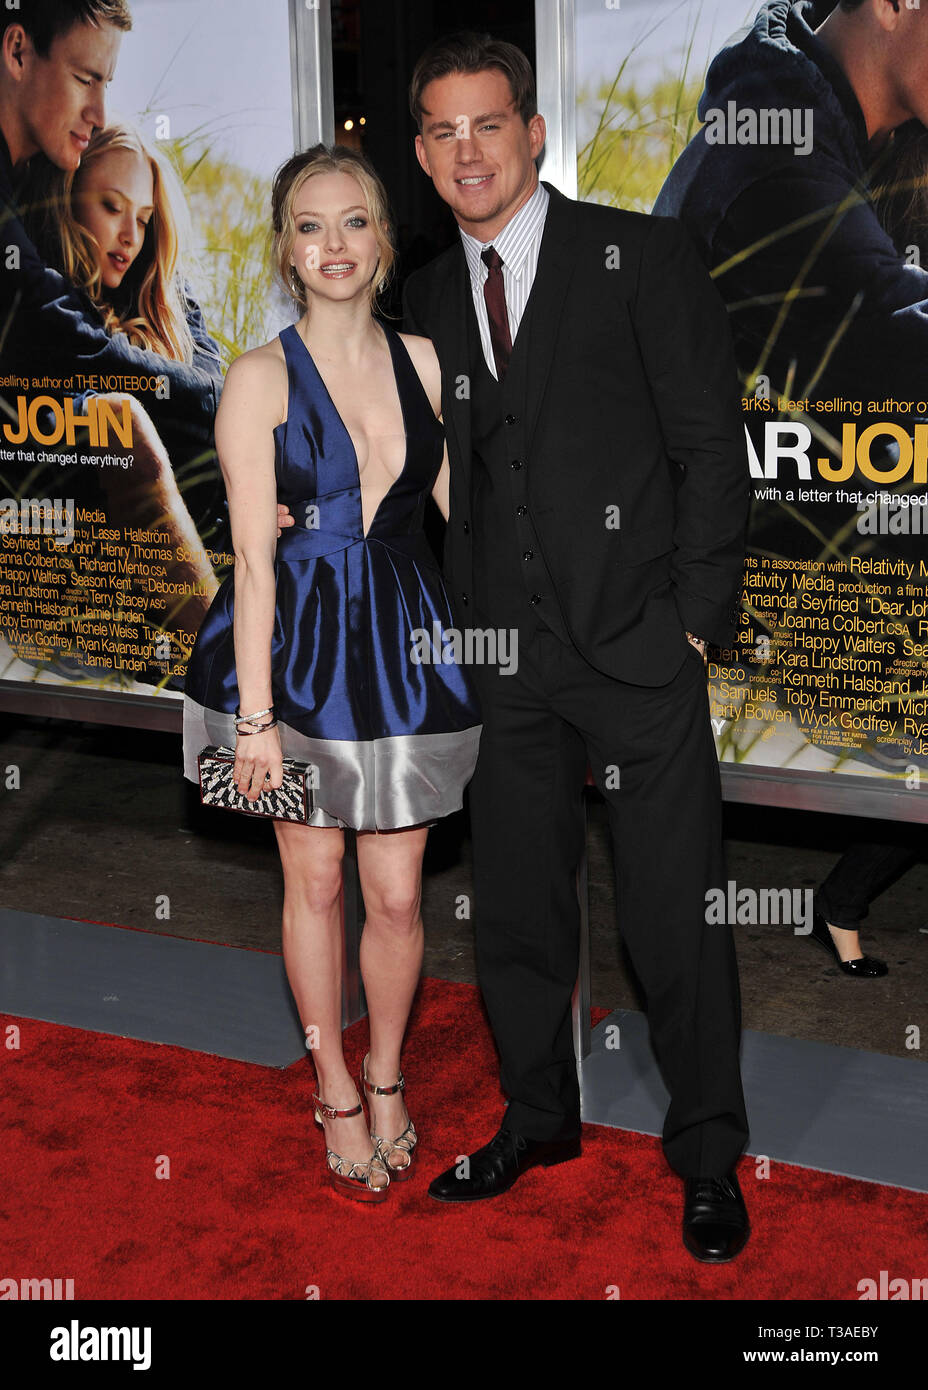 03 Amanda Seyfried Channing Tatum 03 - Dear John Premiere at